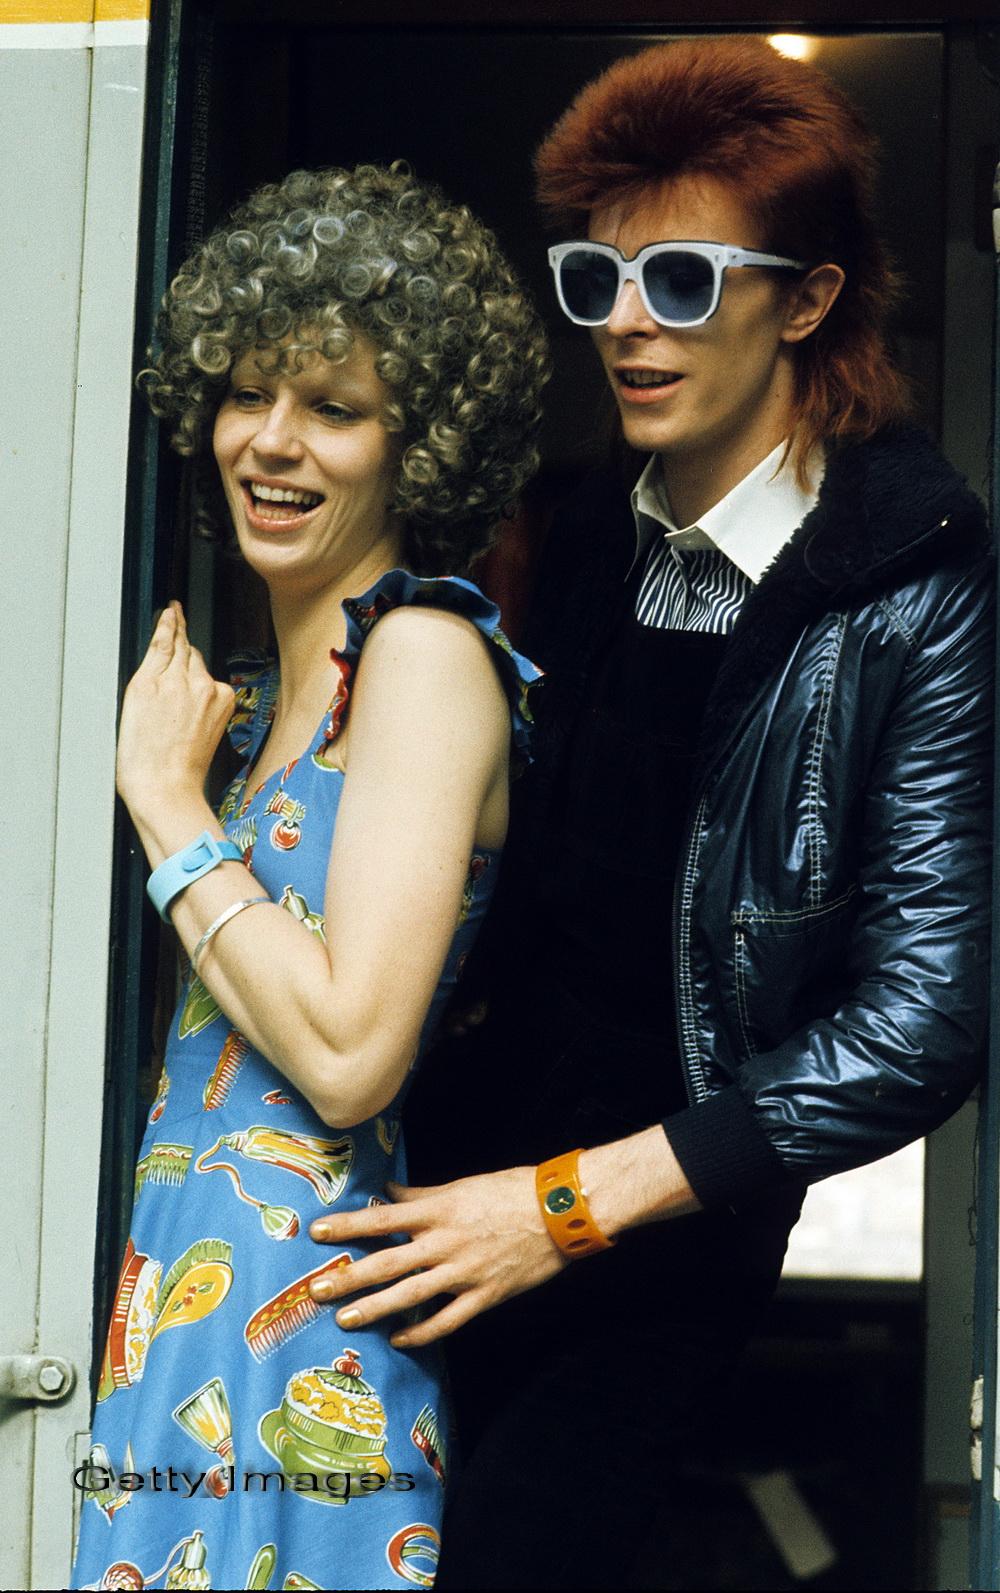 Prima sotie a lui David Bowie, concurenta in